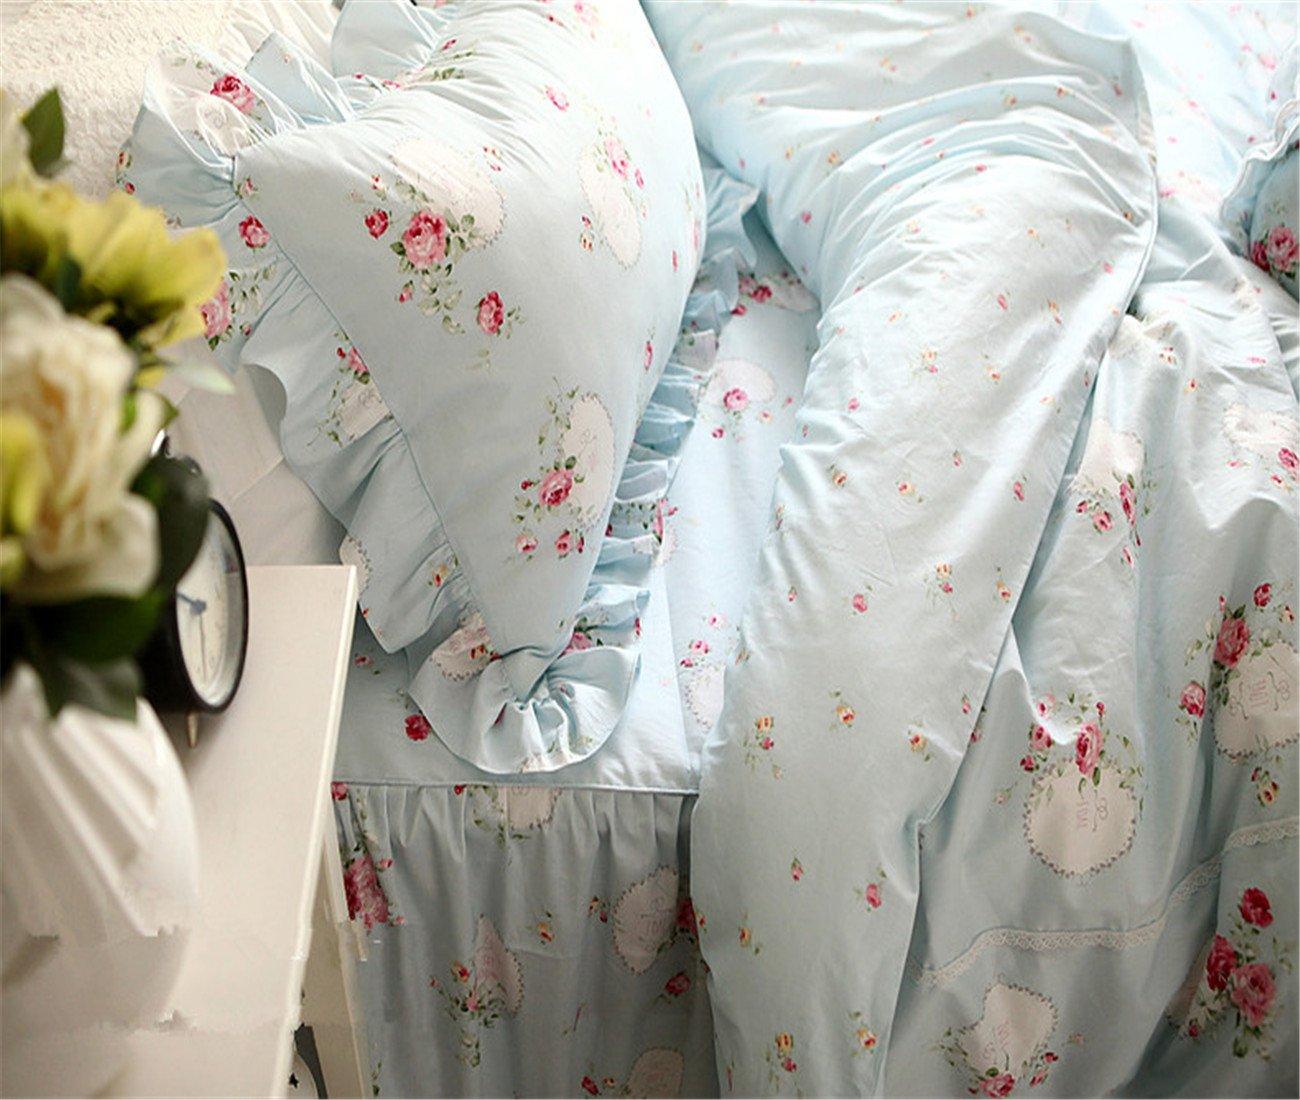 Lotus Karen 100%Cotton Blue Pastoral Flowers 4PC Floral Bed Sheet Set Ruffles Korean Bedding Set With Romantic Love Letters Patterns For Wedding Bedding King,1Duvet Cover,1Bedskirt,2Pillowcases by Lotus Karen (Image #1)